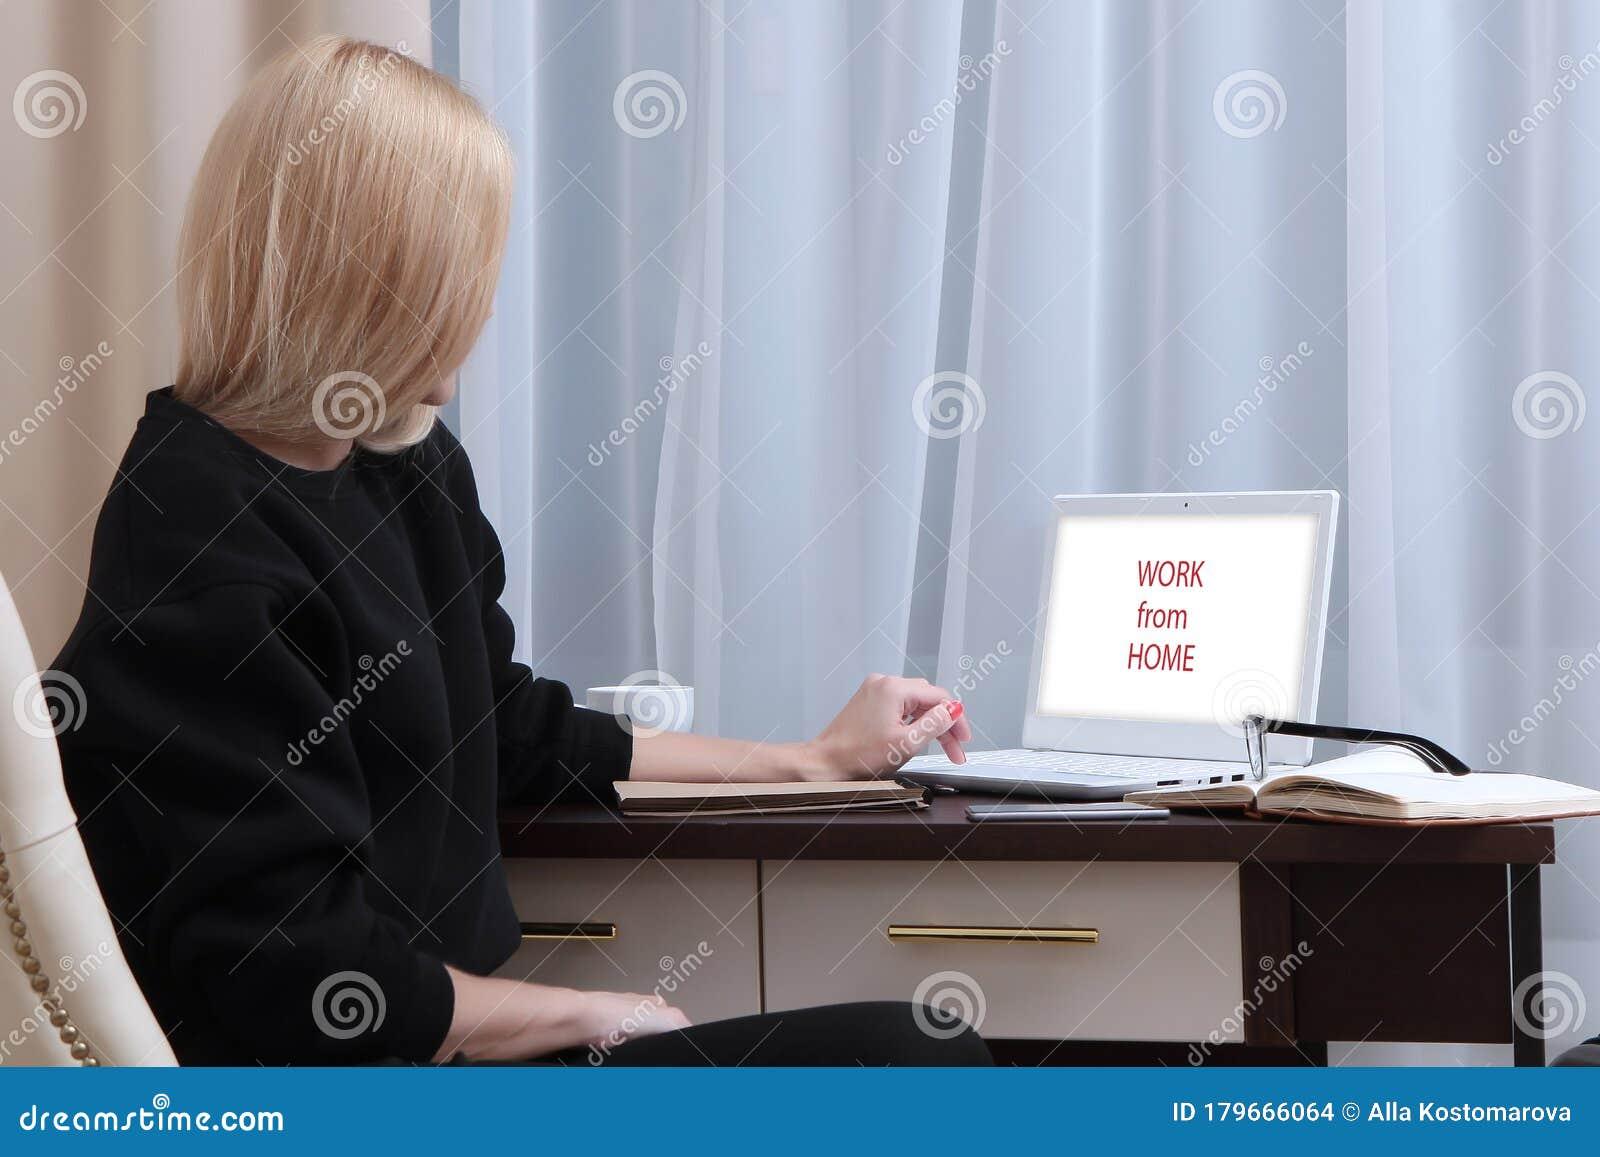 Фото девушек за работой по дому нравится девушка на работе но я женат